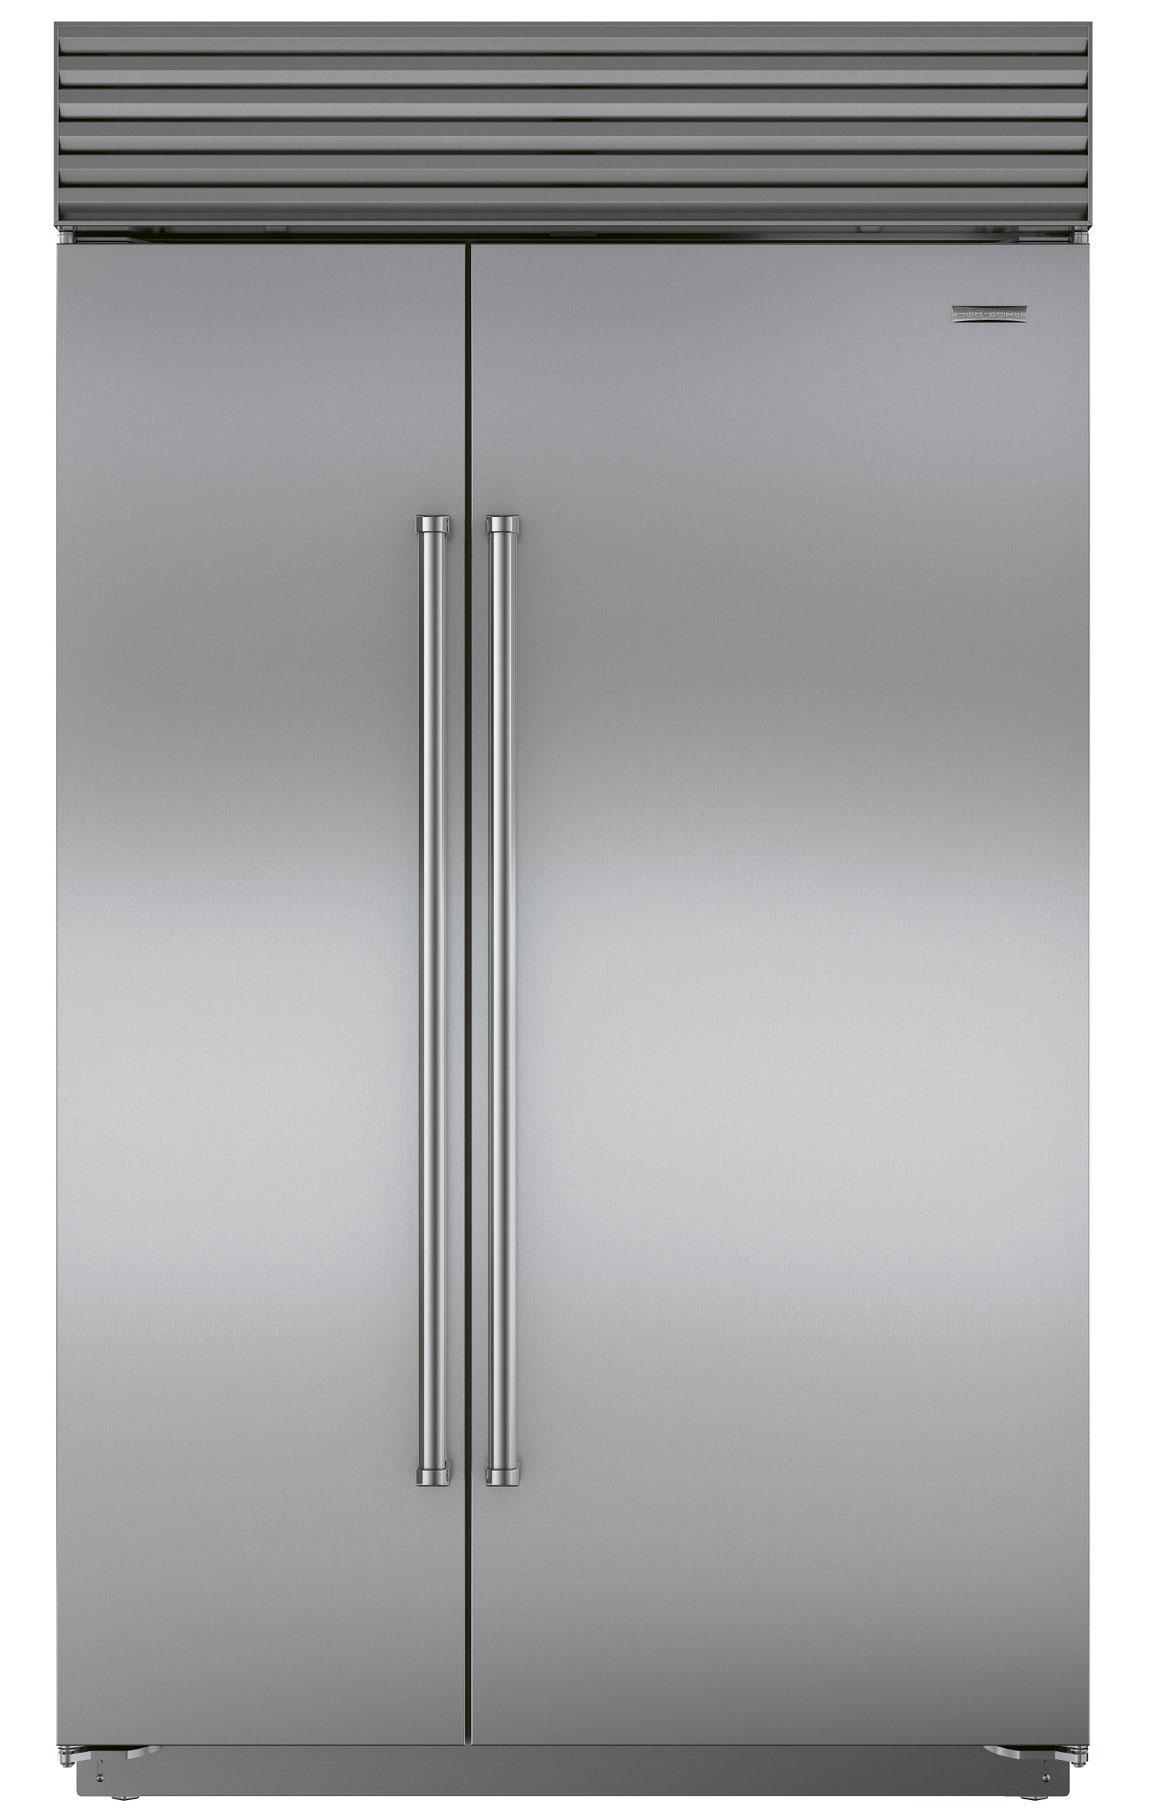 Sub-Zero  side-by-side  refrigerator, $10,599,  at Ferguson Bath, Kitchen, & Lighting Gallery